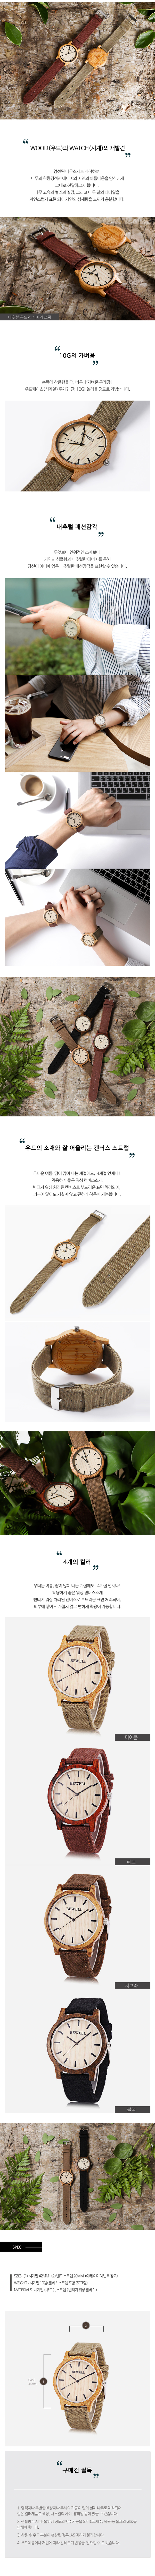 Bewell The Base 4컬러 우드손목커플시계 - 비웰, 45,000원, 남성시계, 패션시계